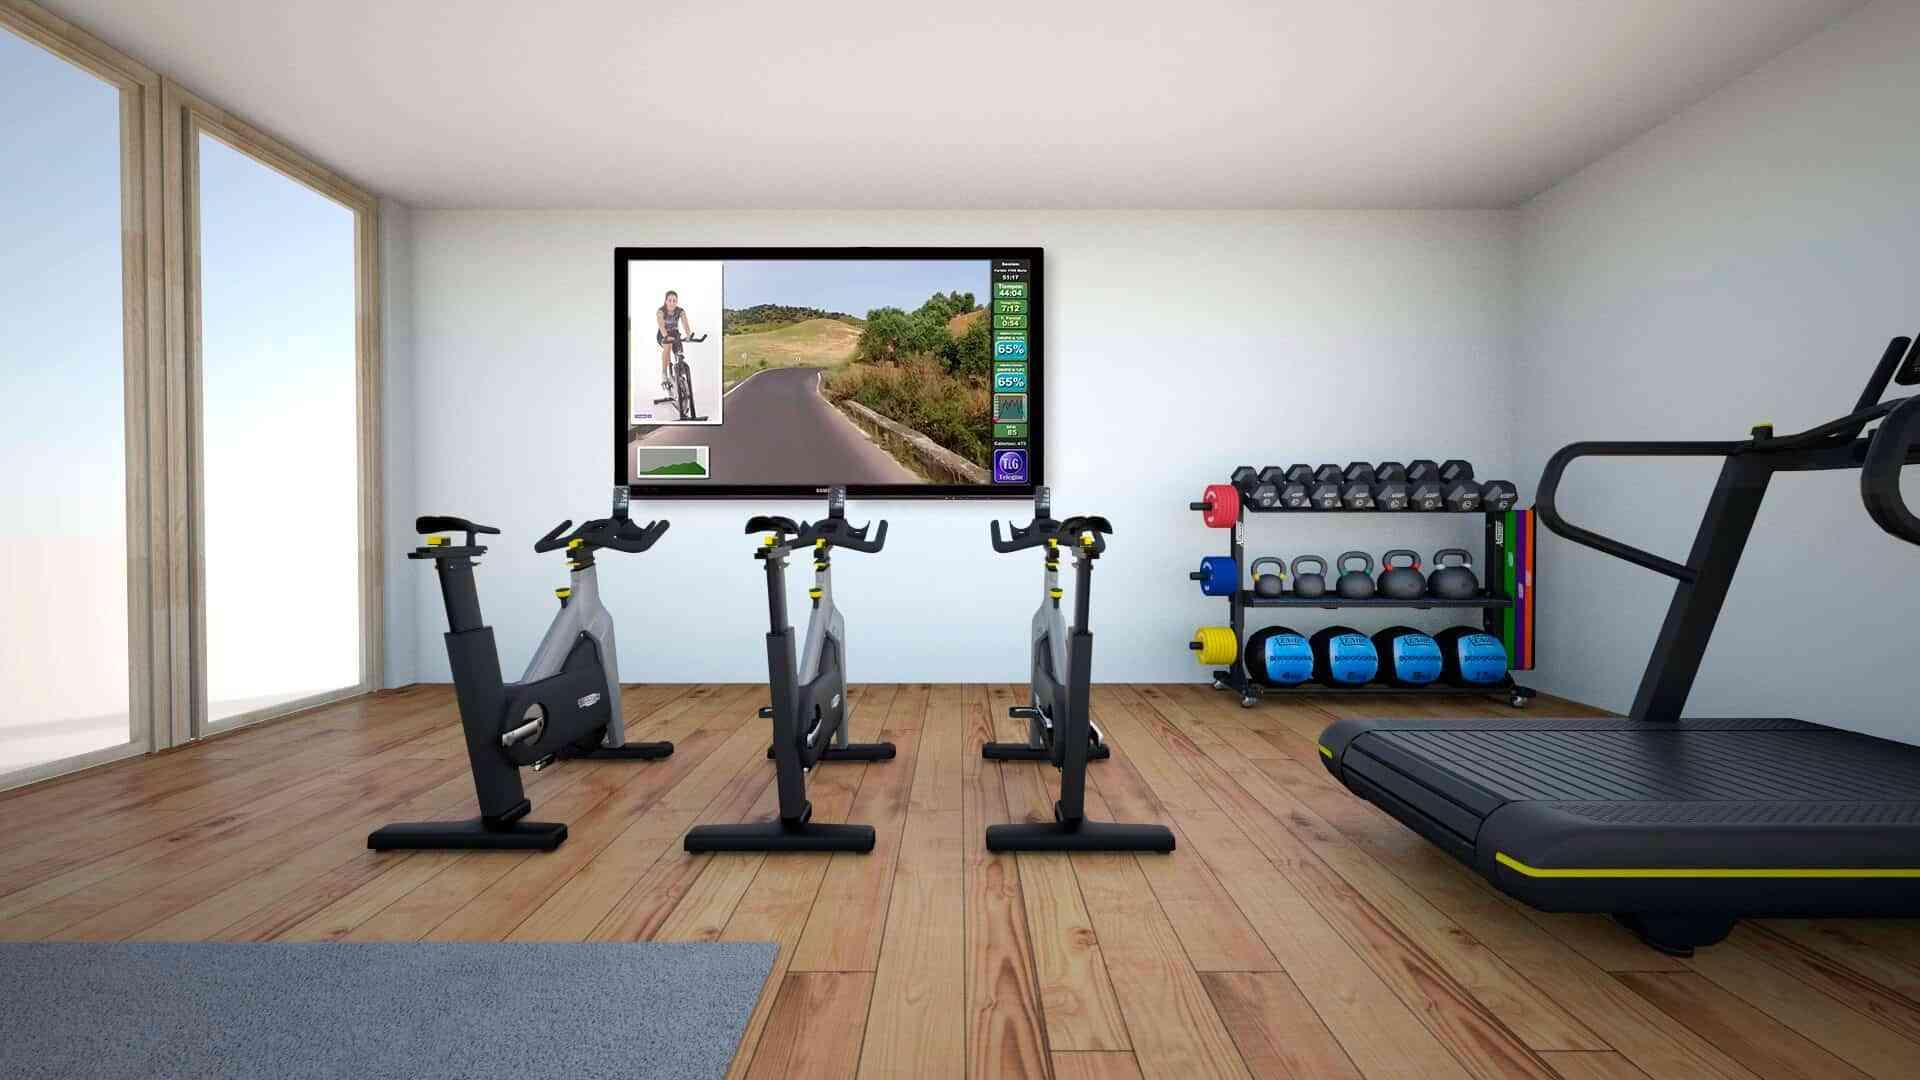 7 ideas para decorar tu gimnasio en casa 6